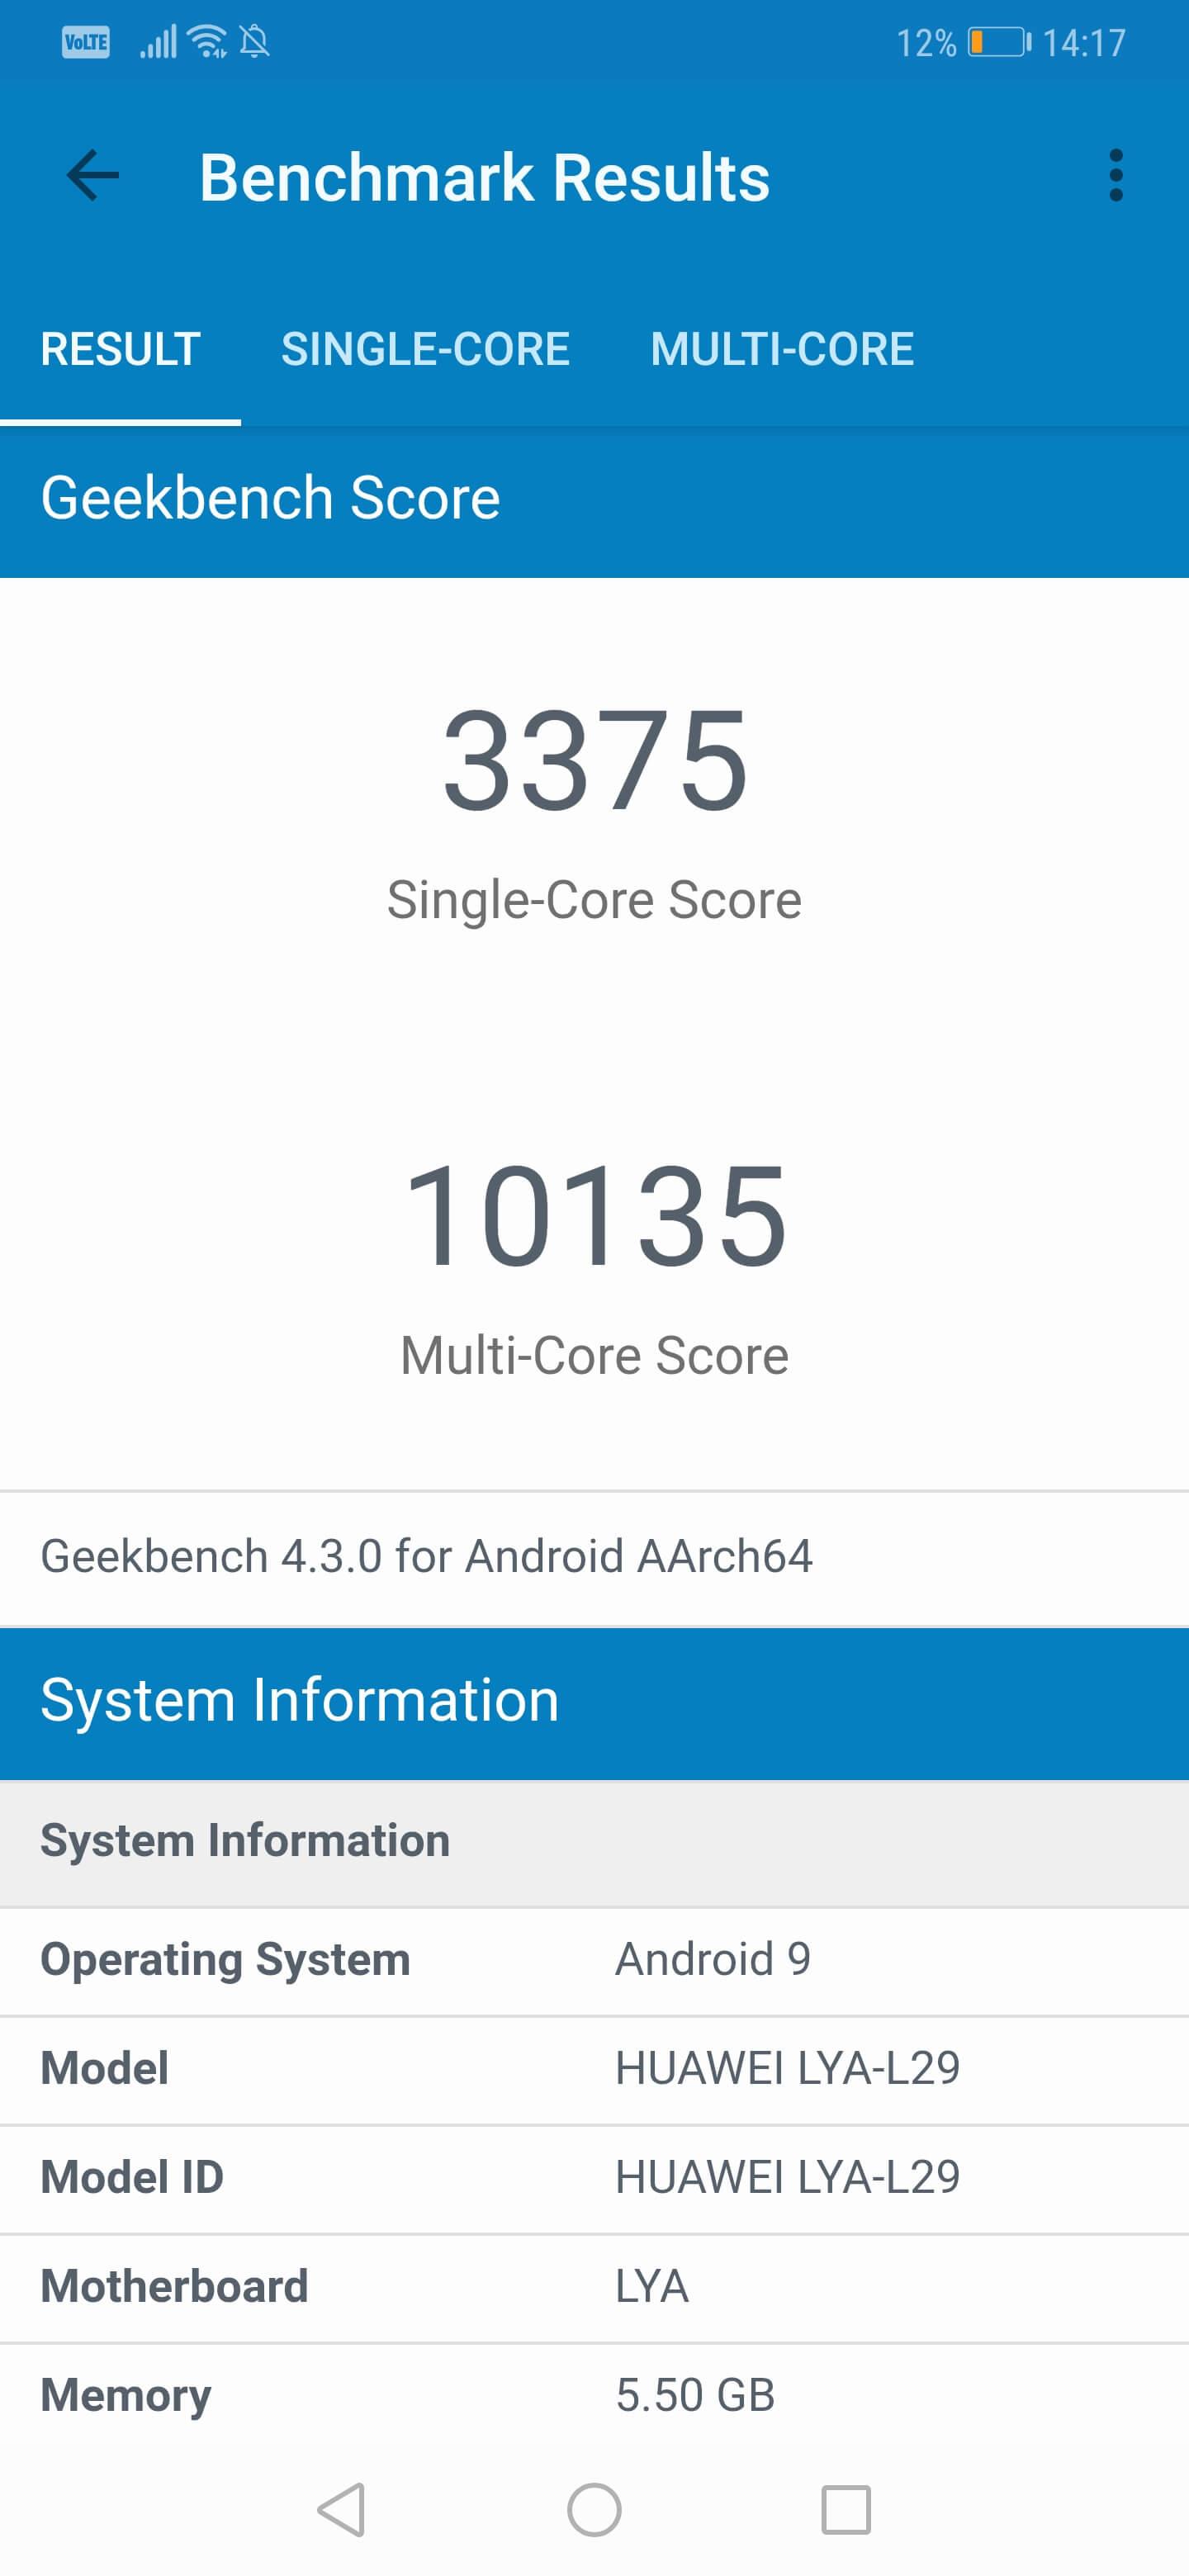 Huawei Mate 20 Pro Bechmark Geekbench 4